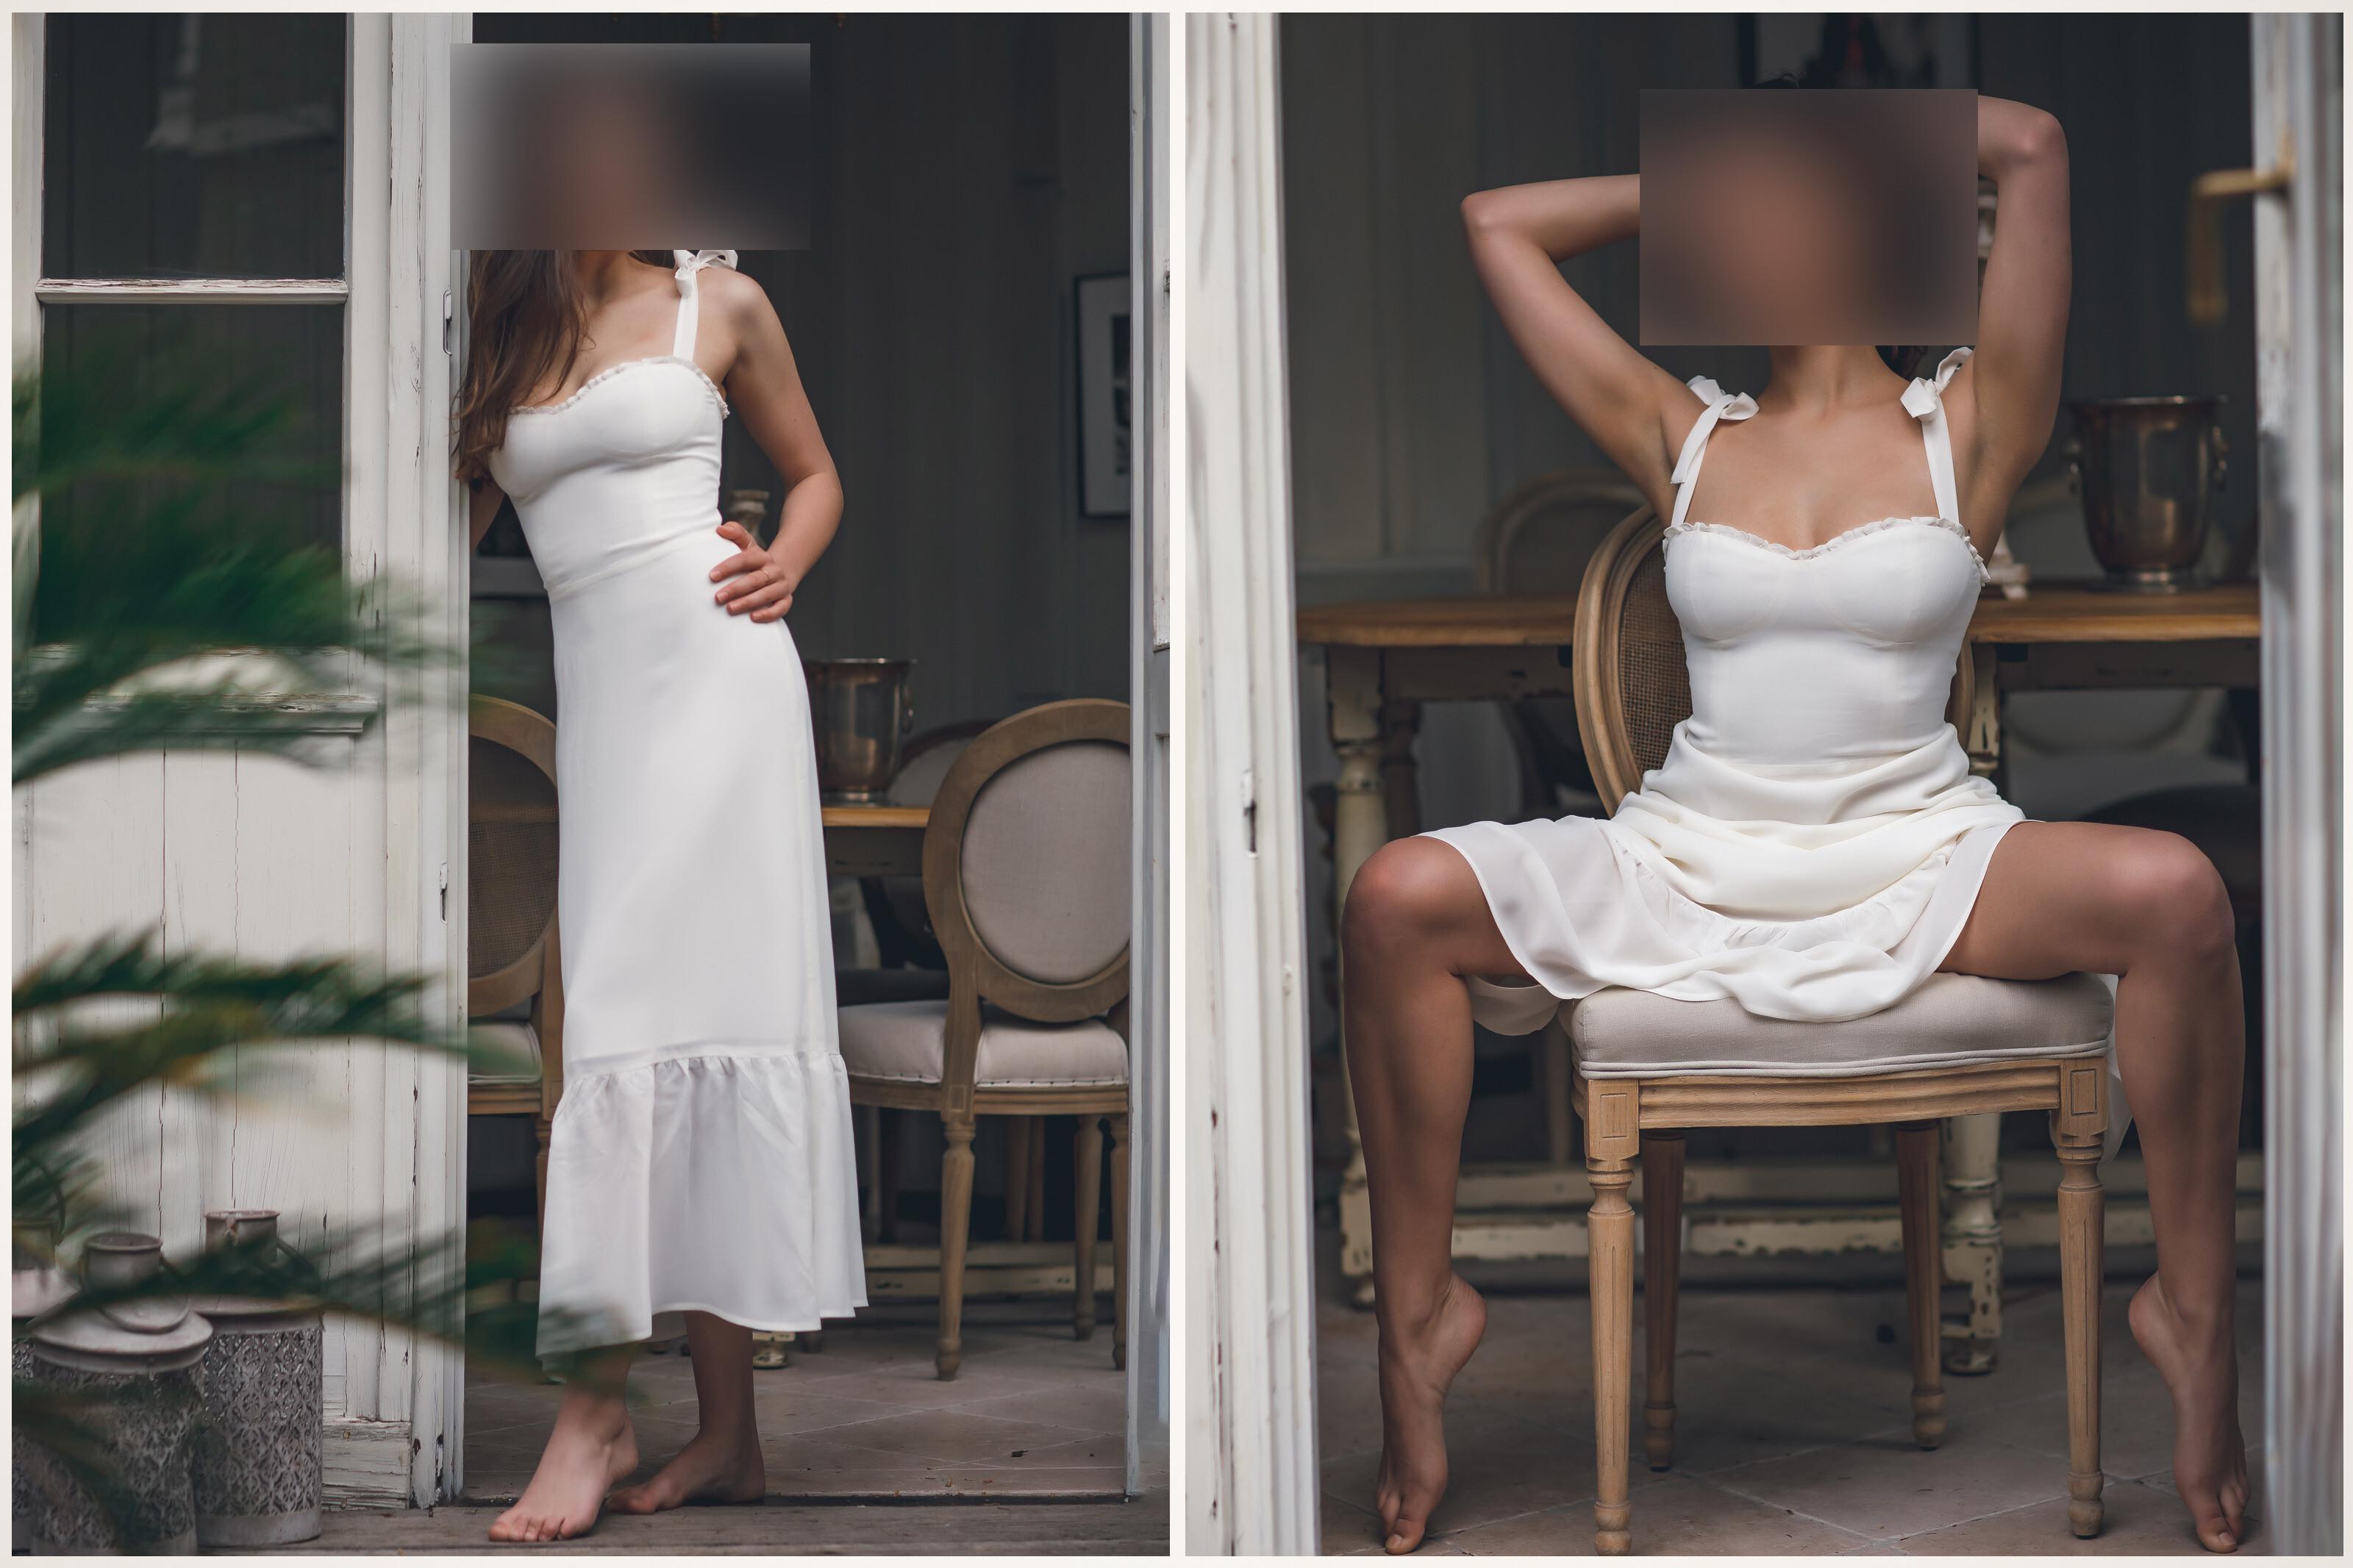 Kristin from Aphrodite Agency